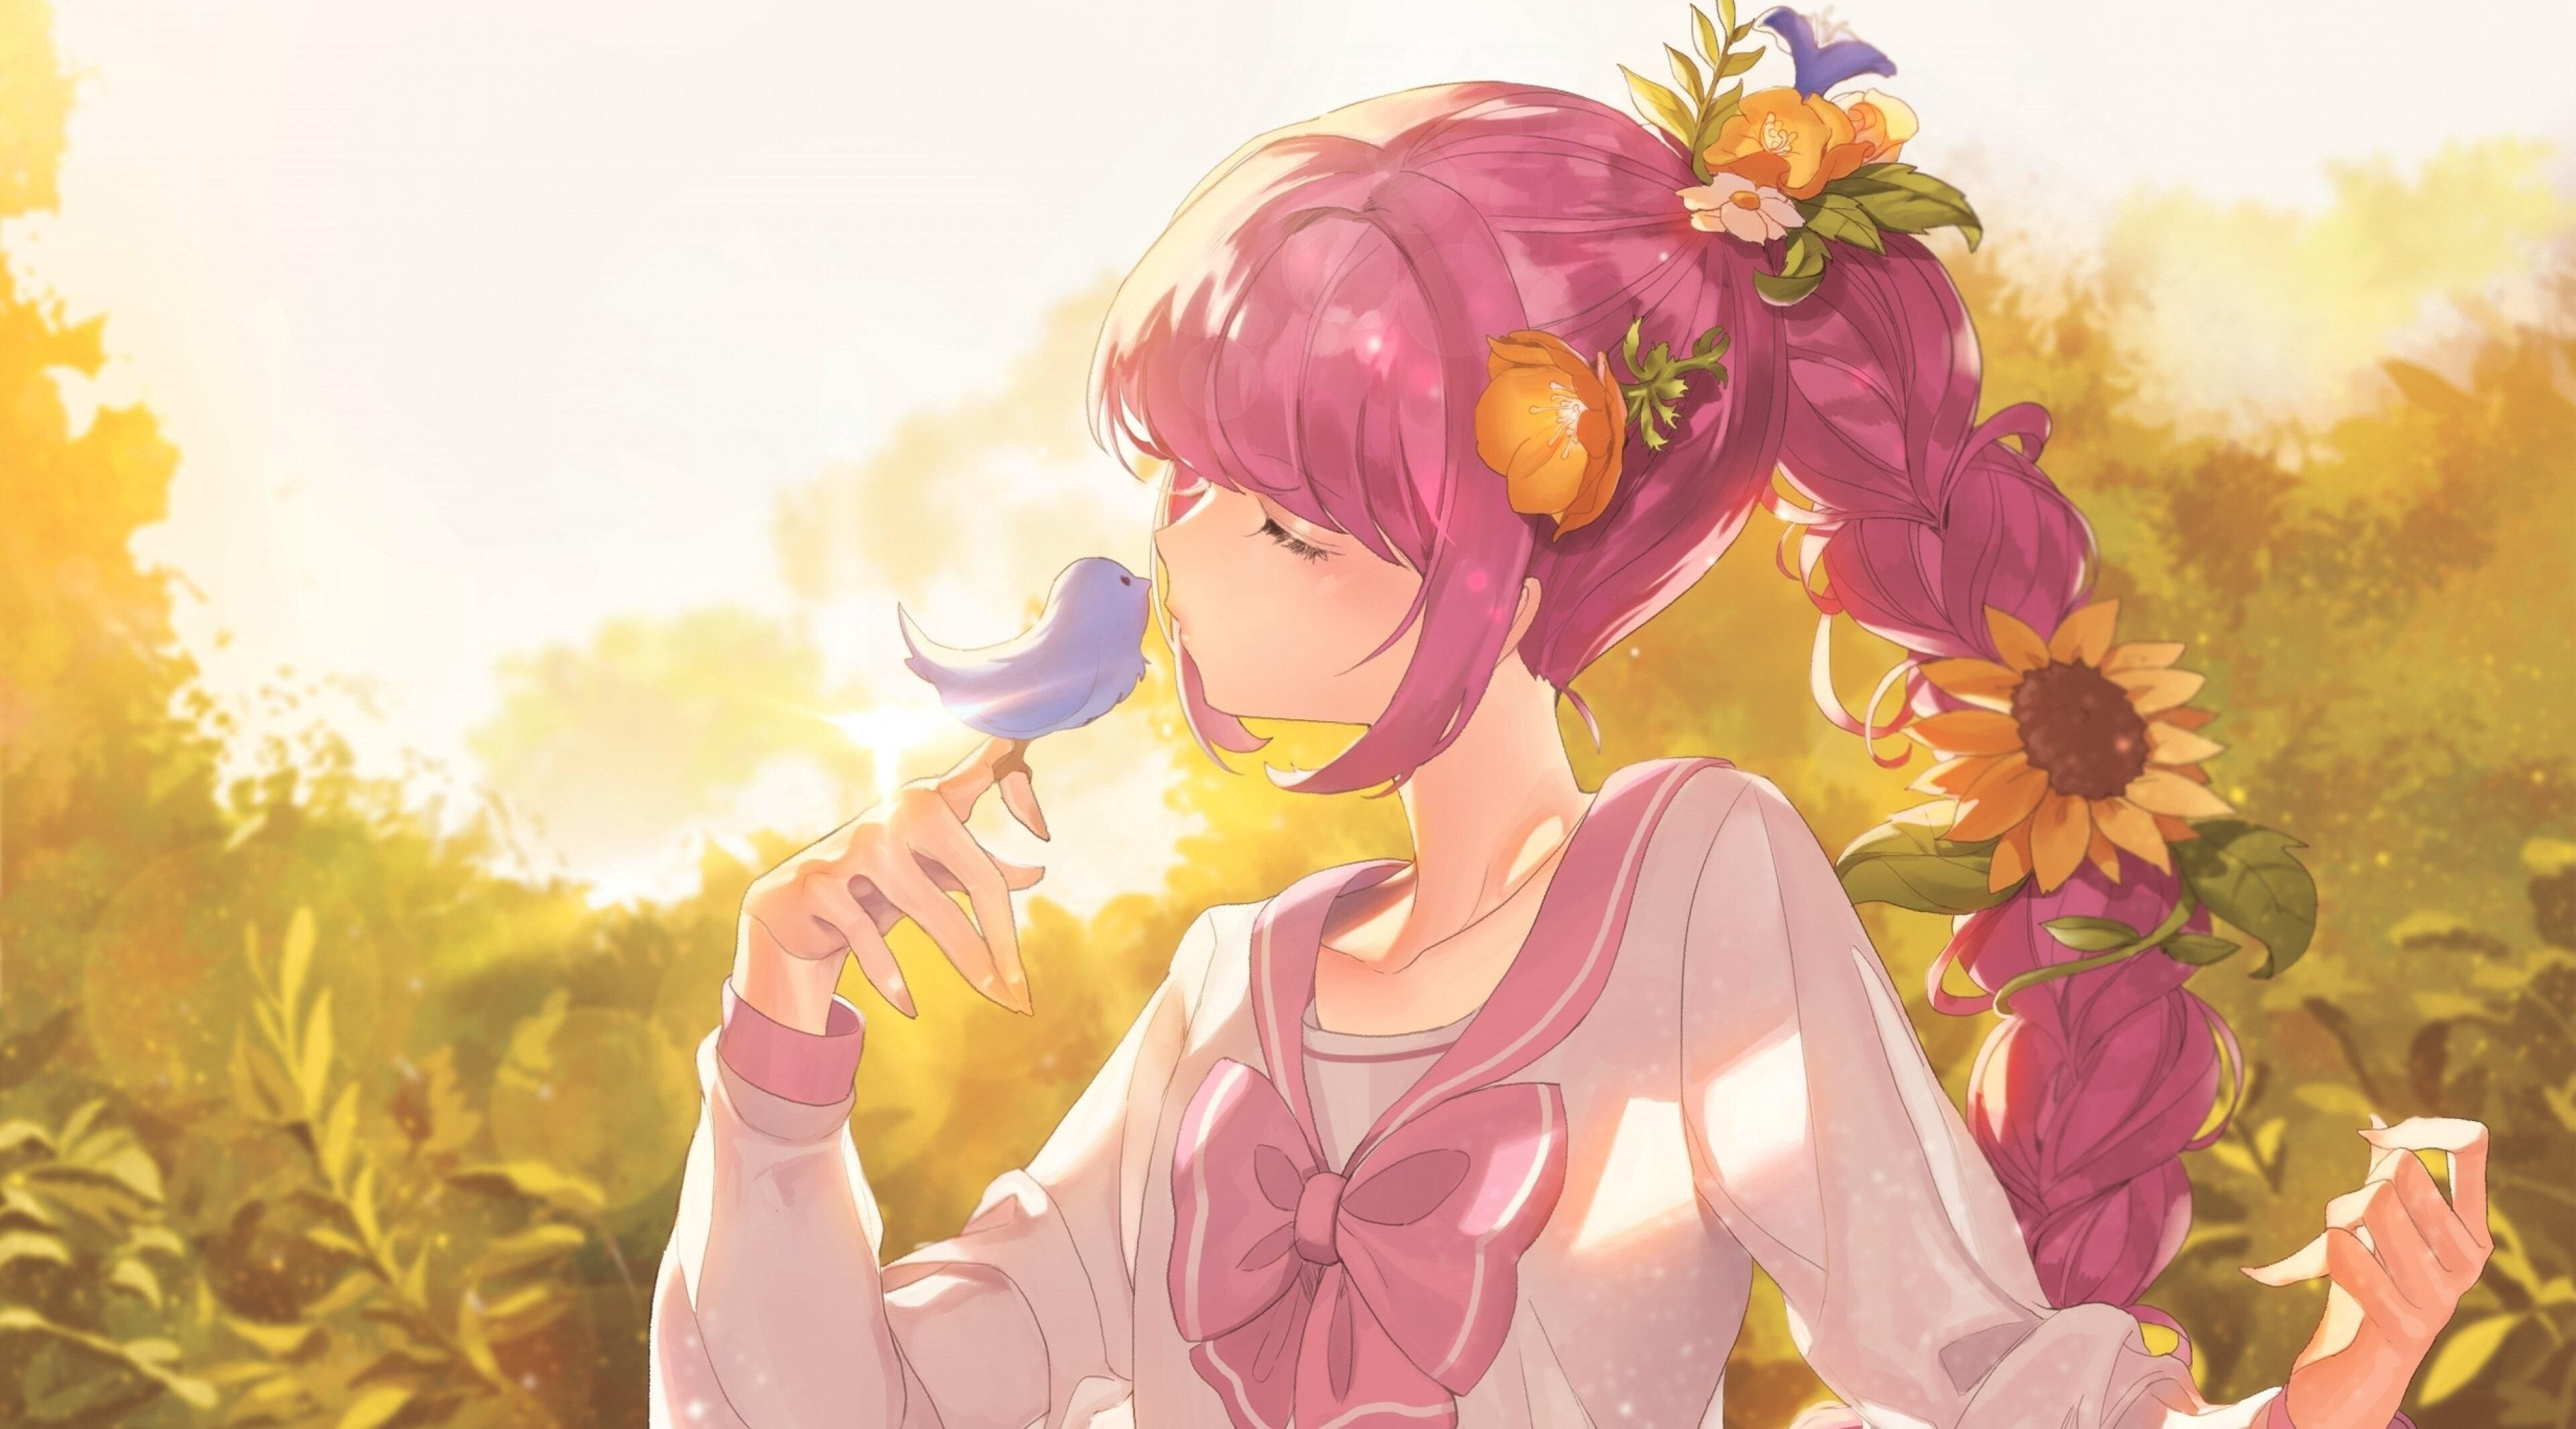 Pastel Aesthetic Anime Wallpapers On Wallpaperdog